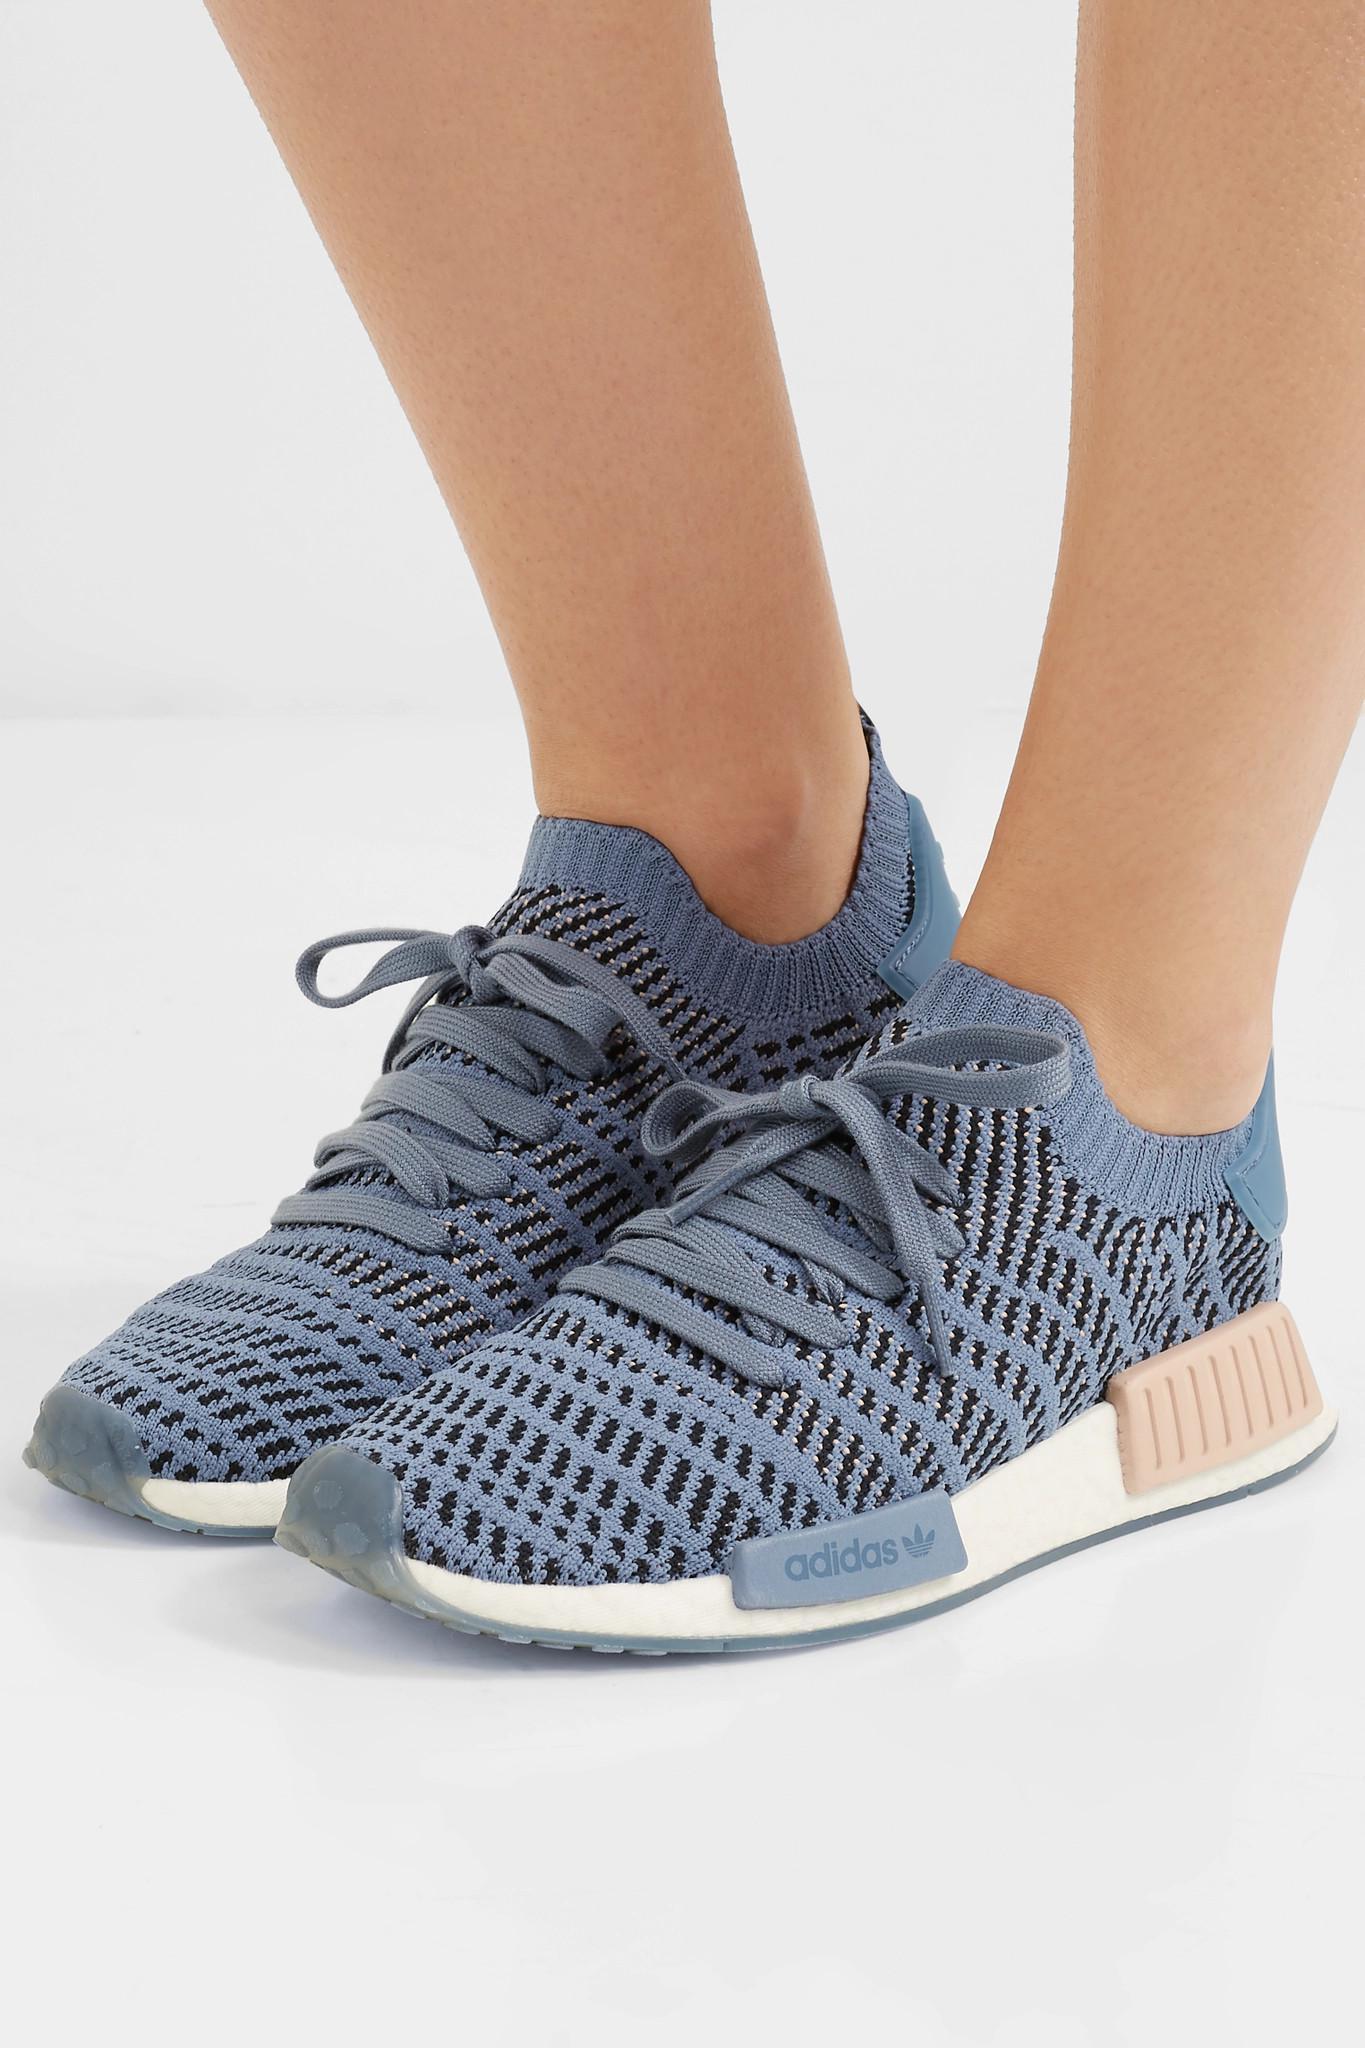 2fb8c8651a076 Adidas Originals - Blue Nmd r1 Rubber-trimmed Primeknit Sneakers - Lyst.  View fullscreen